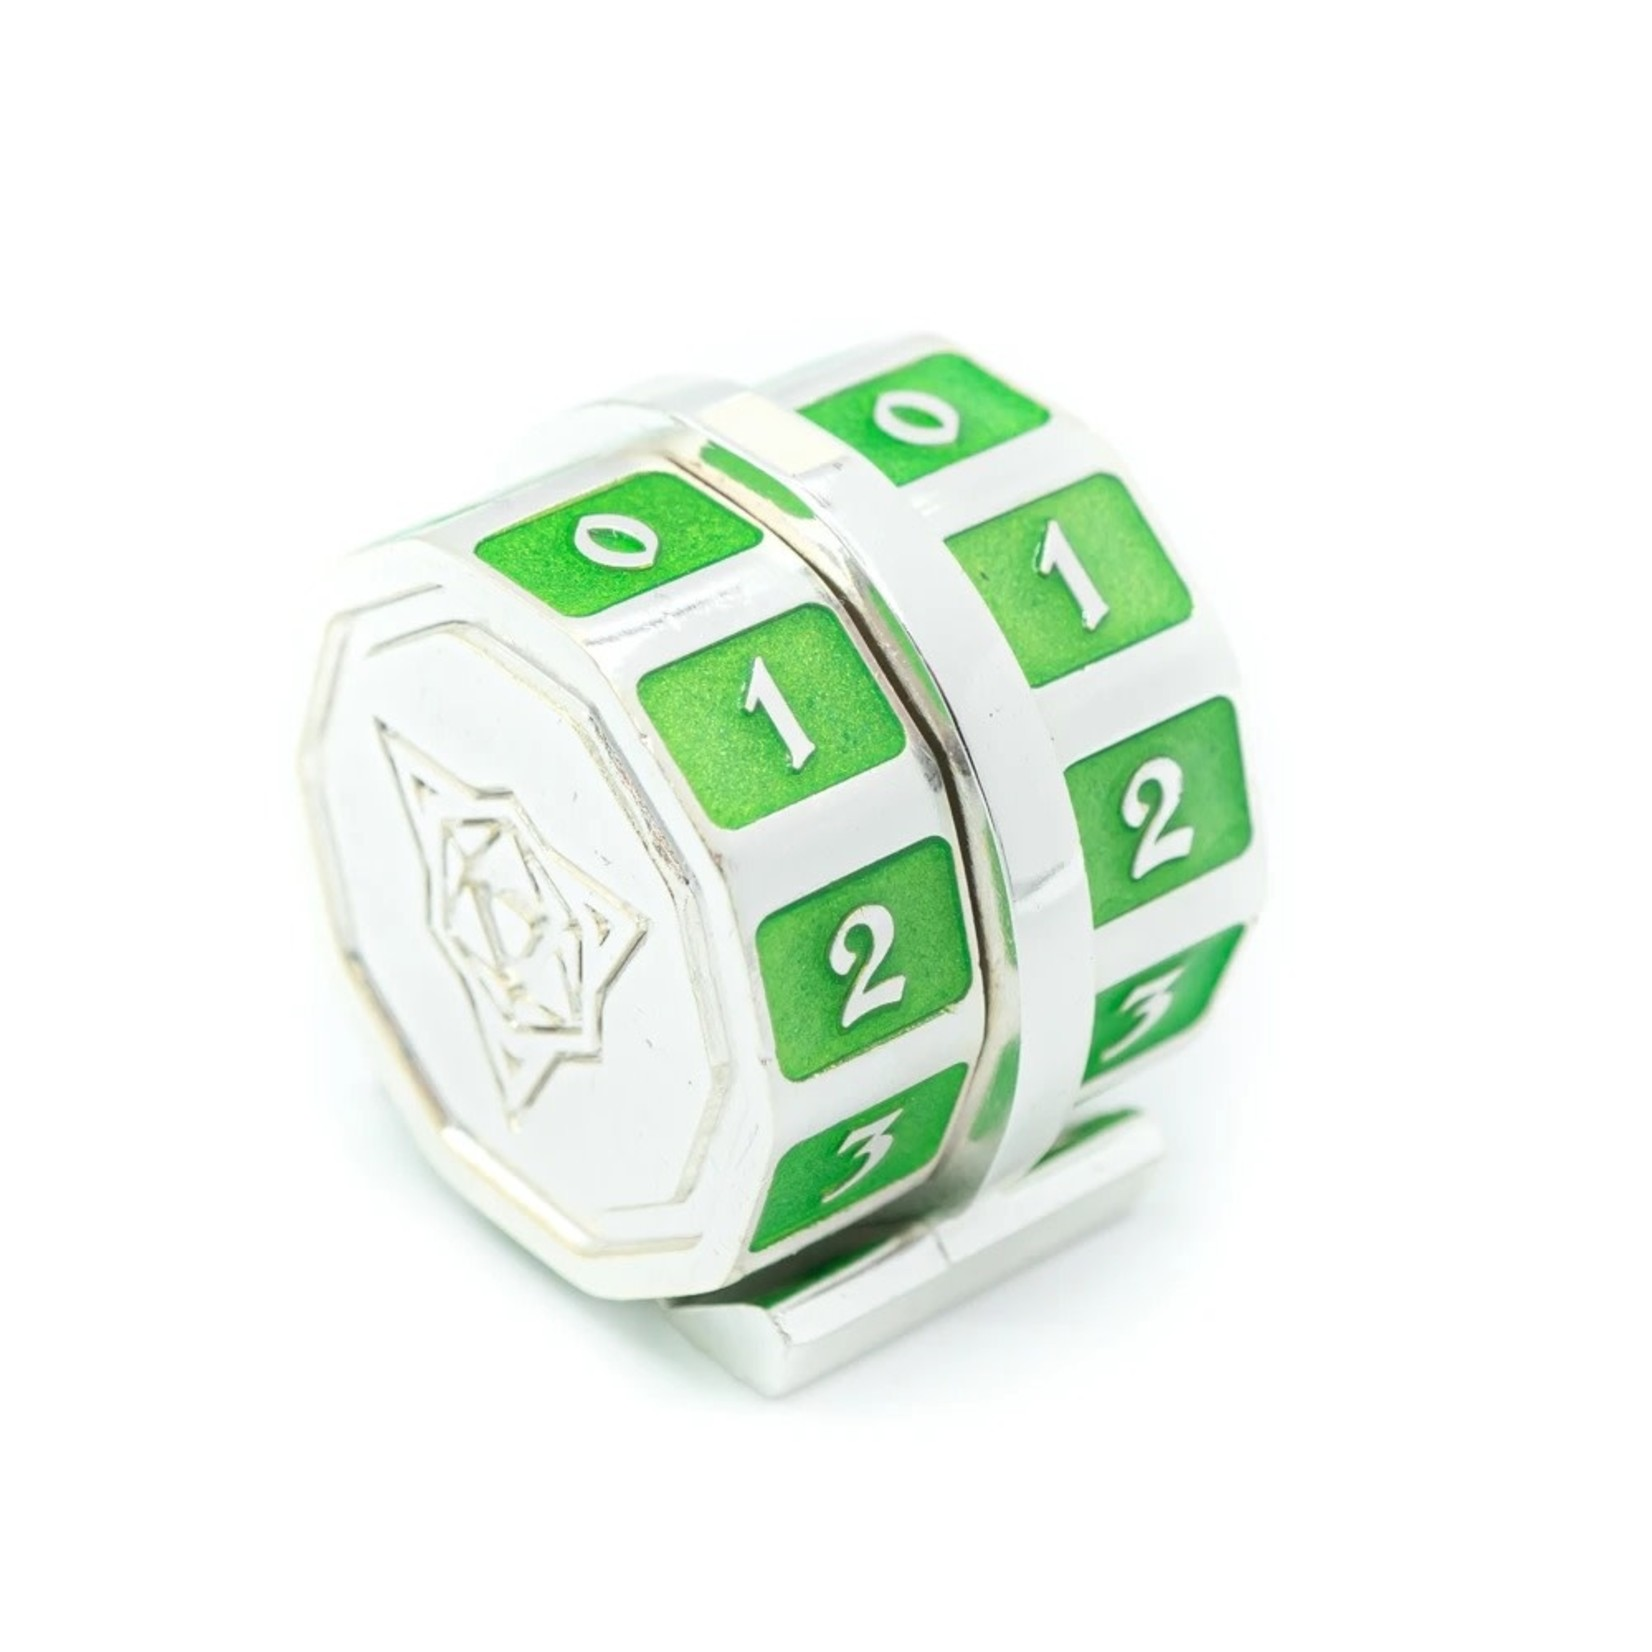 Die Hard Dice Die Hard Dice: Metal Magic the Gathering Life Counter (Green)